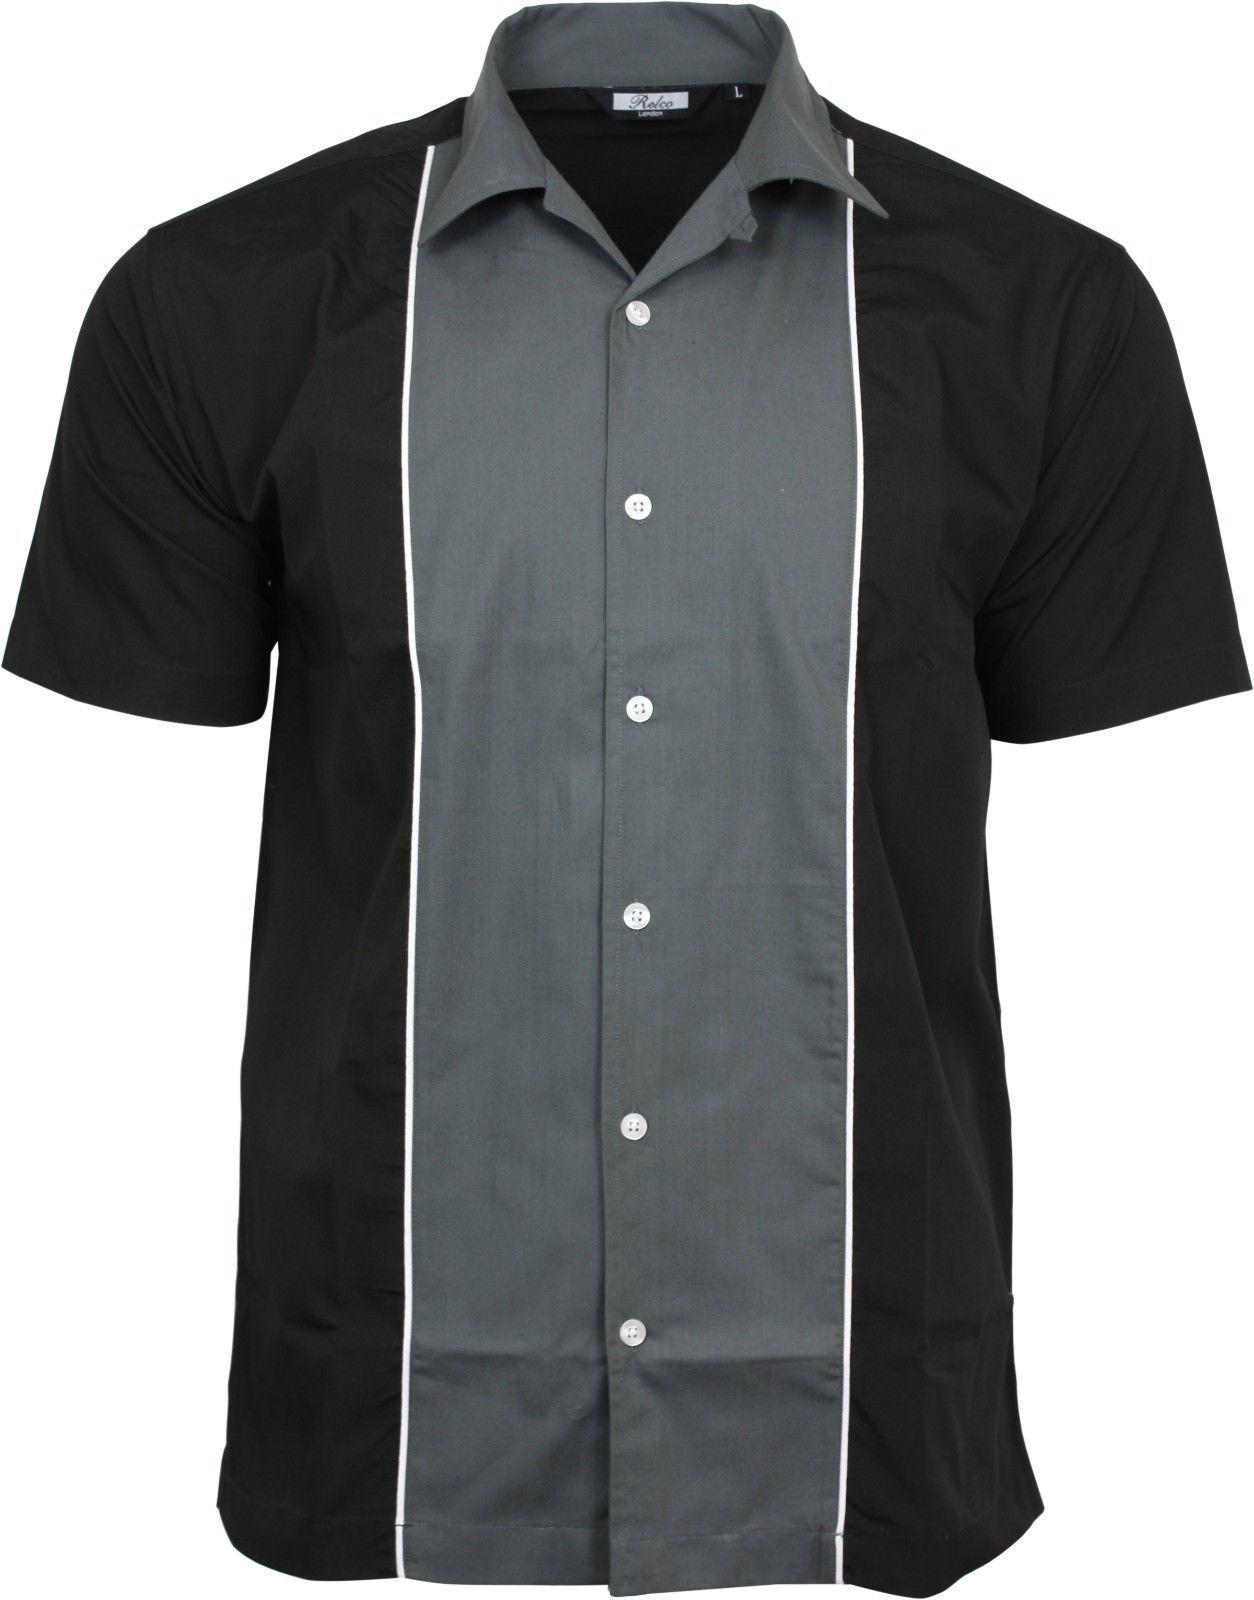 men/'s rockabilly clothing 1950s vintage online bowling shirts black white club